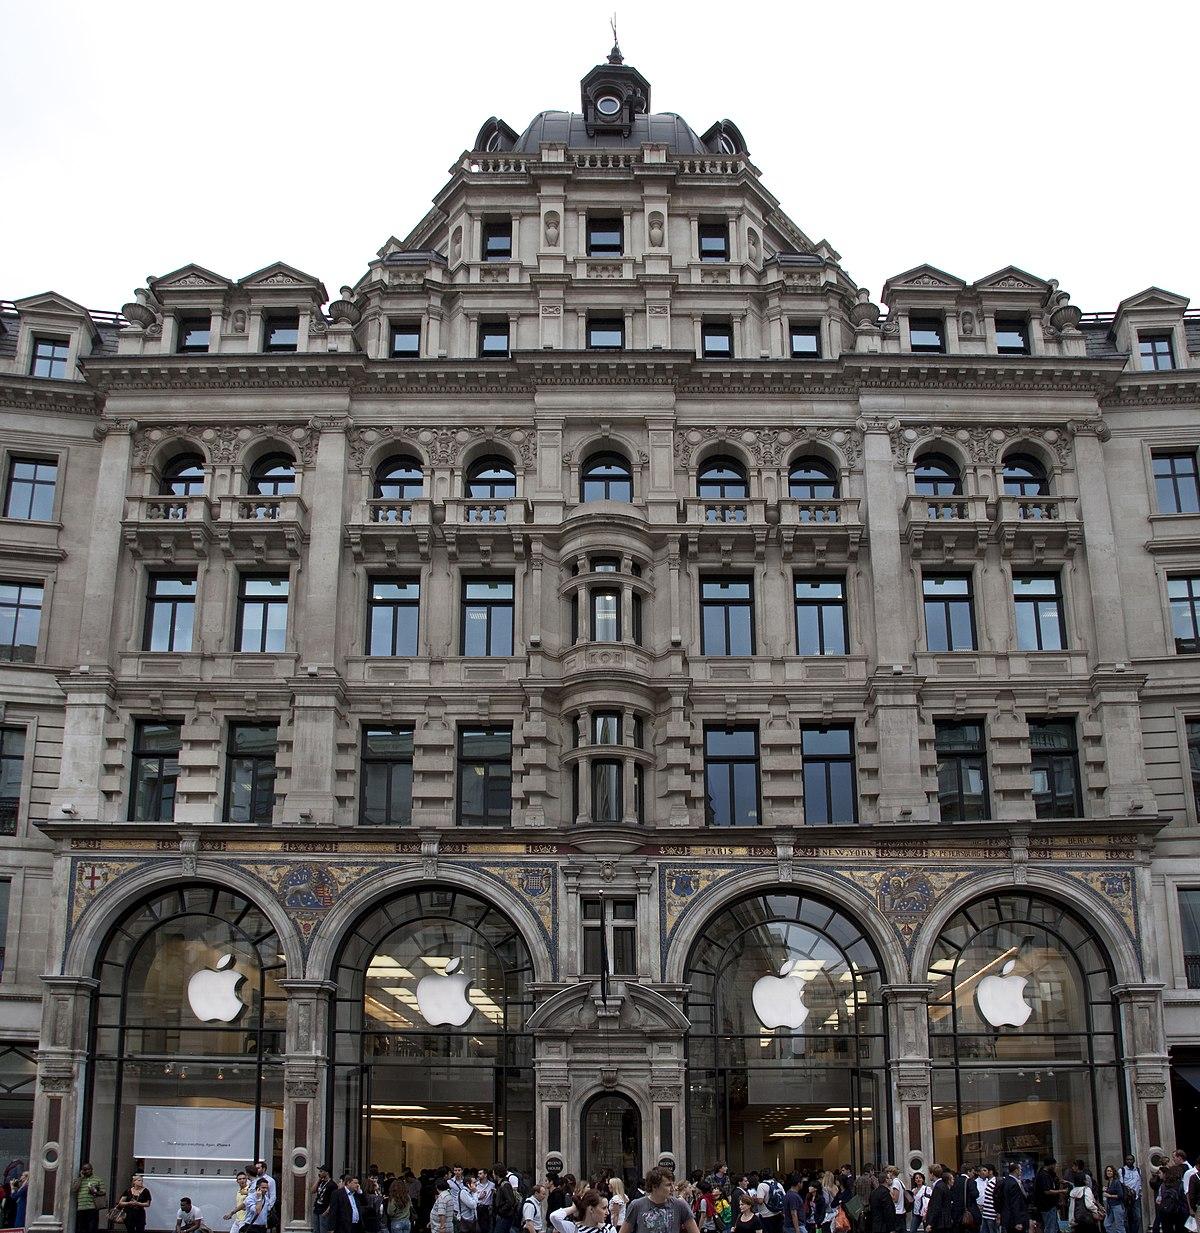 St George Hotel London Regent Street